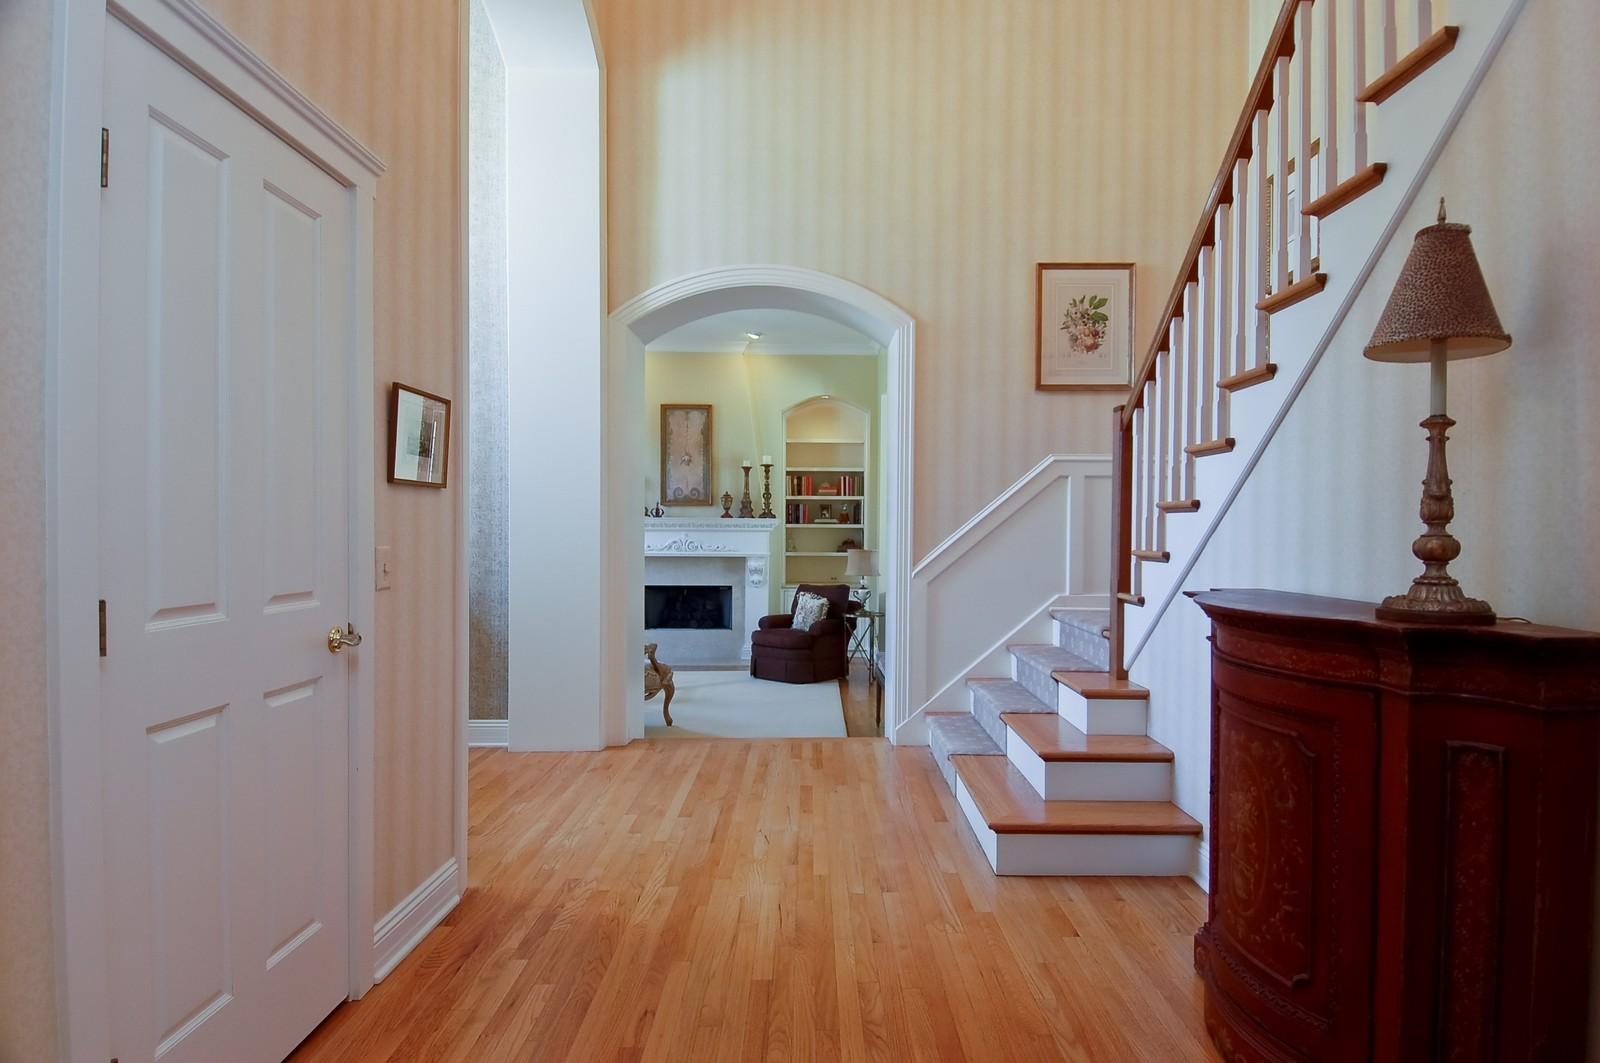 Real Estate Photography - 1492 Lloyd, Wheaton, IL, 60189 - Hallway/Gallery